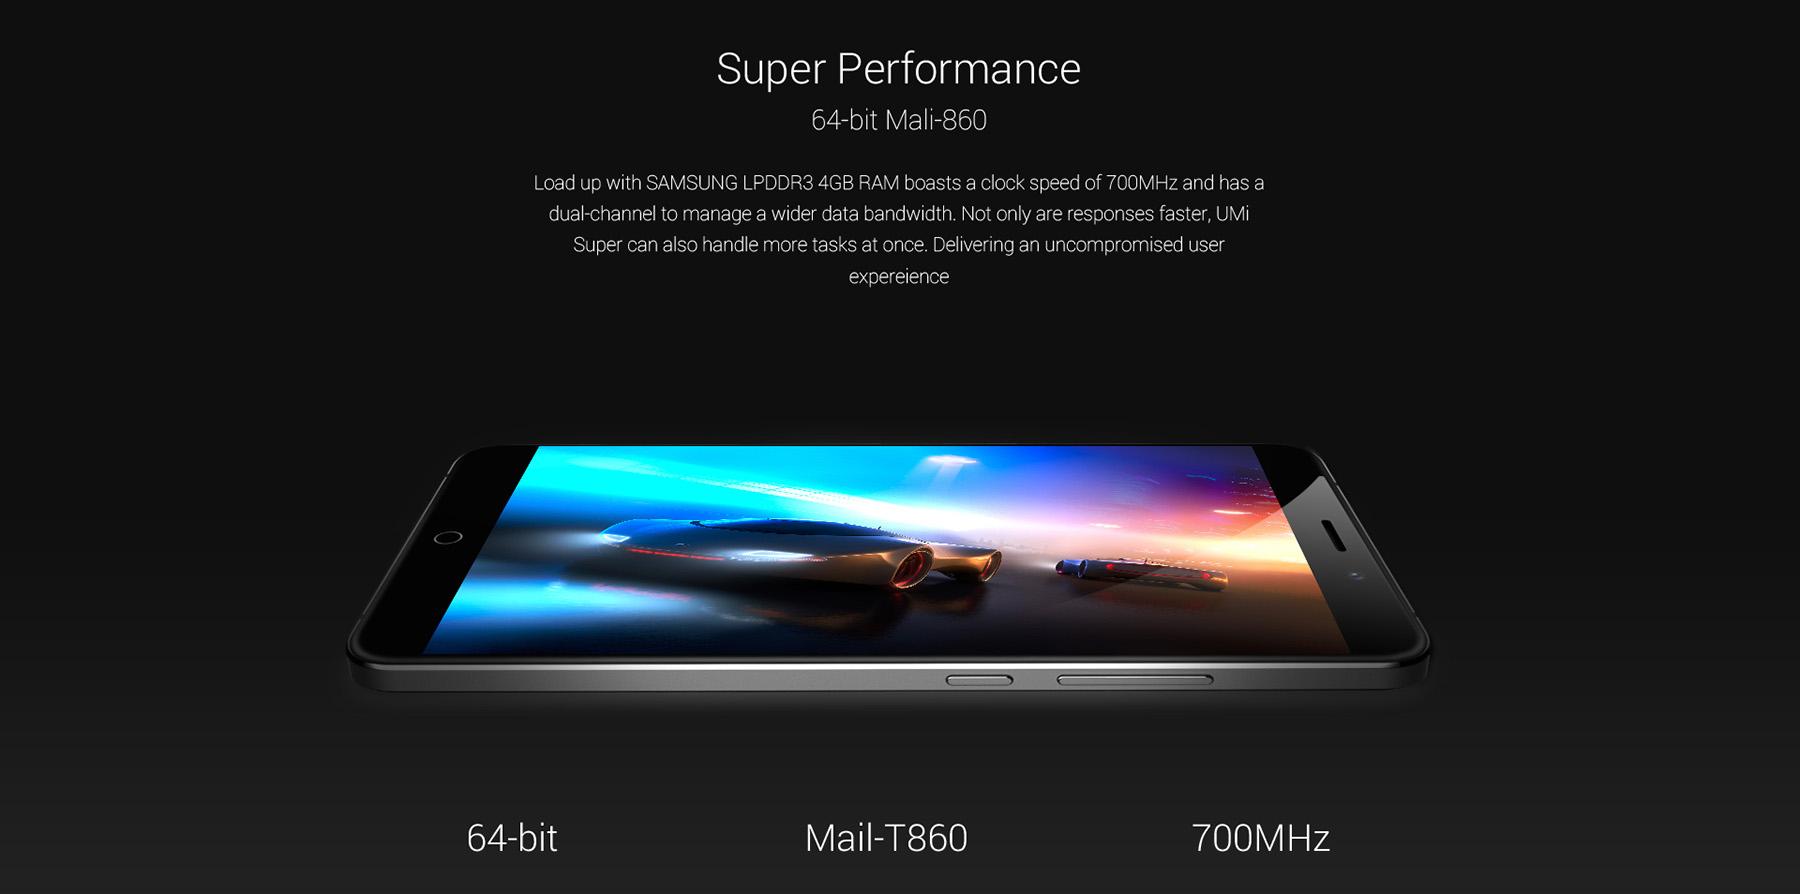 UMI Super , Display retina Sharp, 401ppi, 4GB RAM, rooten root, Android 6.0, Anleitung rooten